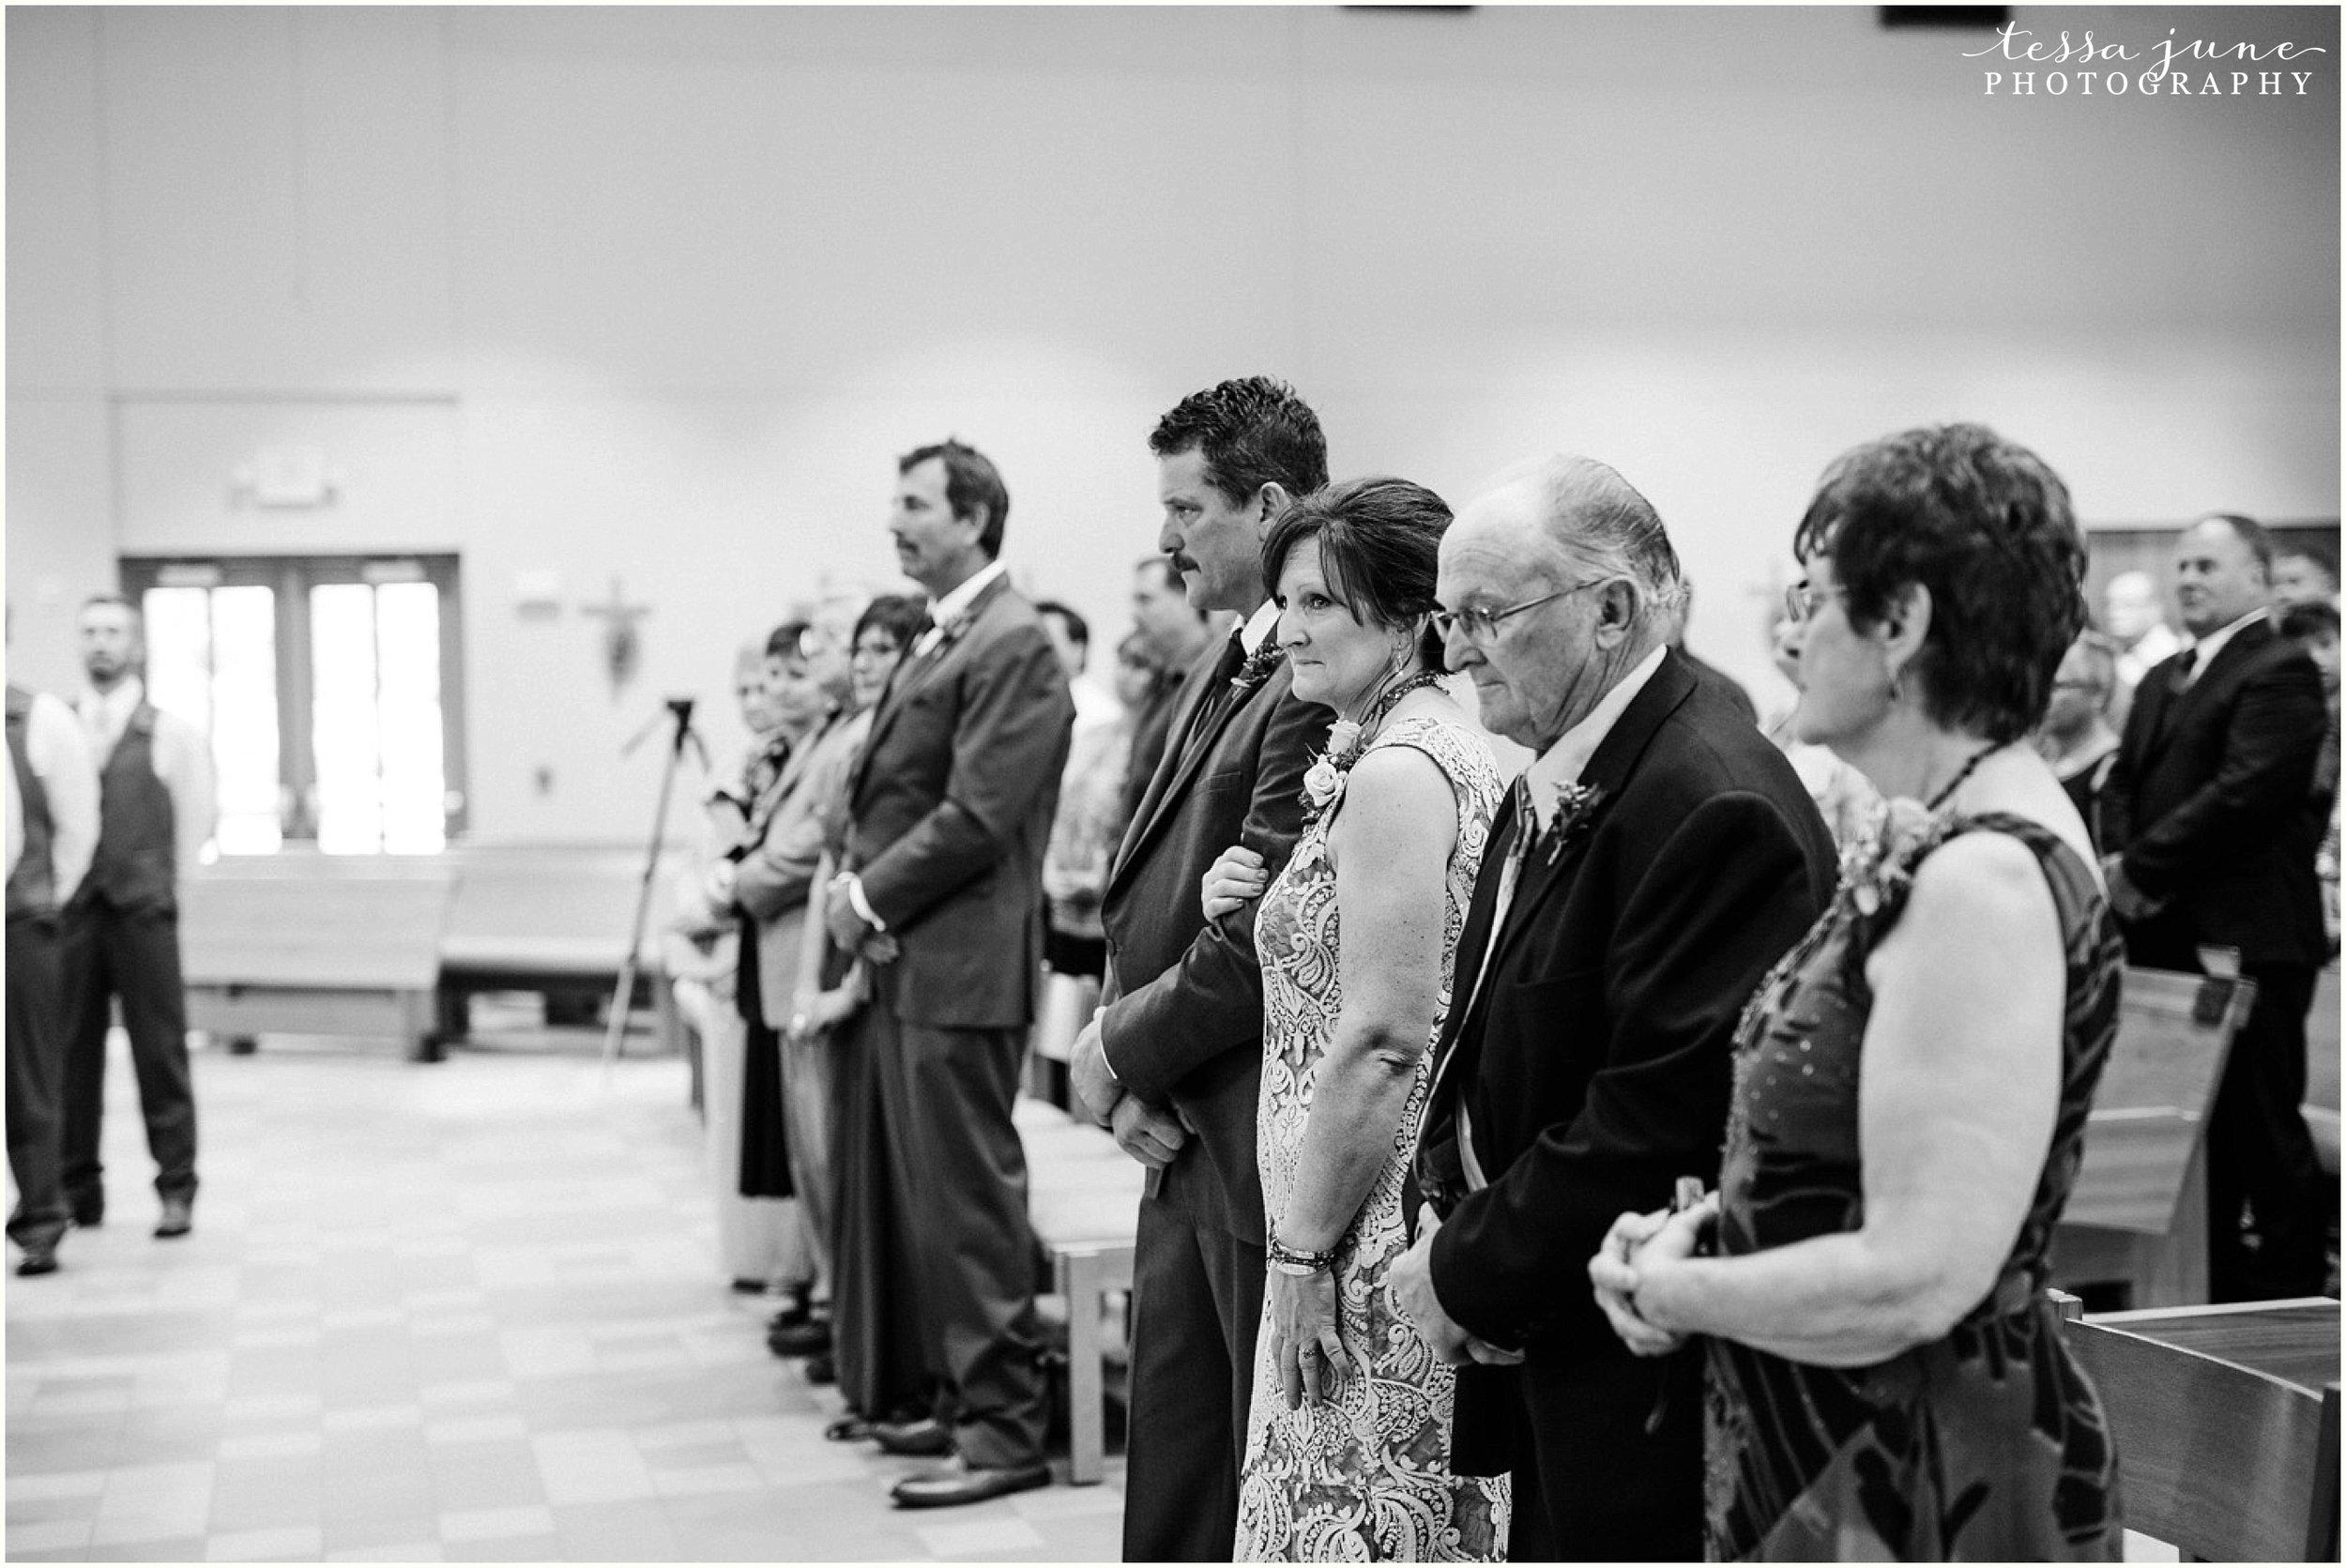 bohemian-minnesota-wedding-mismatched-bridesmaid-dresses-waterfall-st-cloud-tessa-june-photography-105.jpg